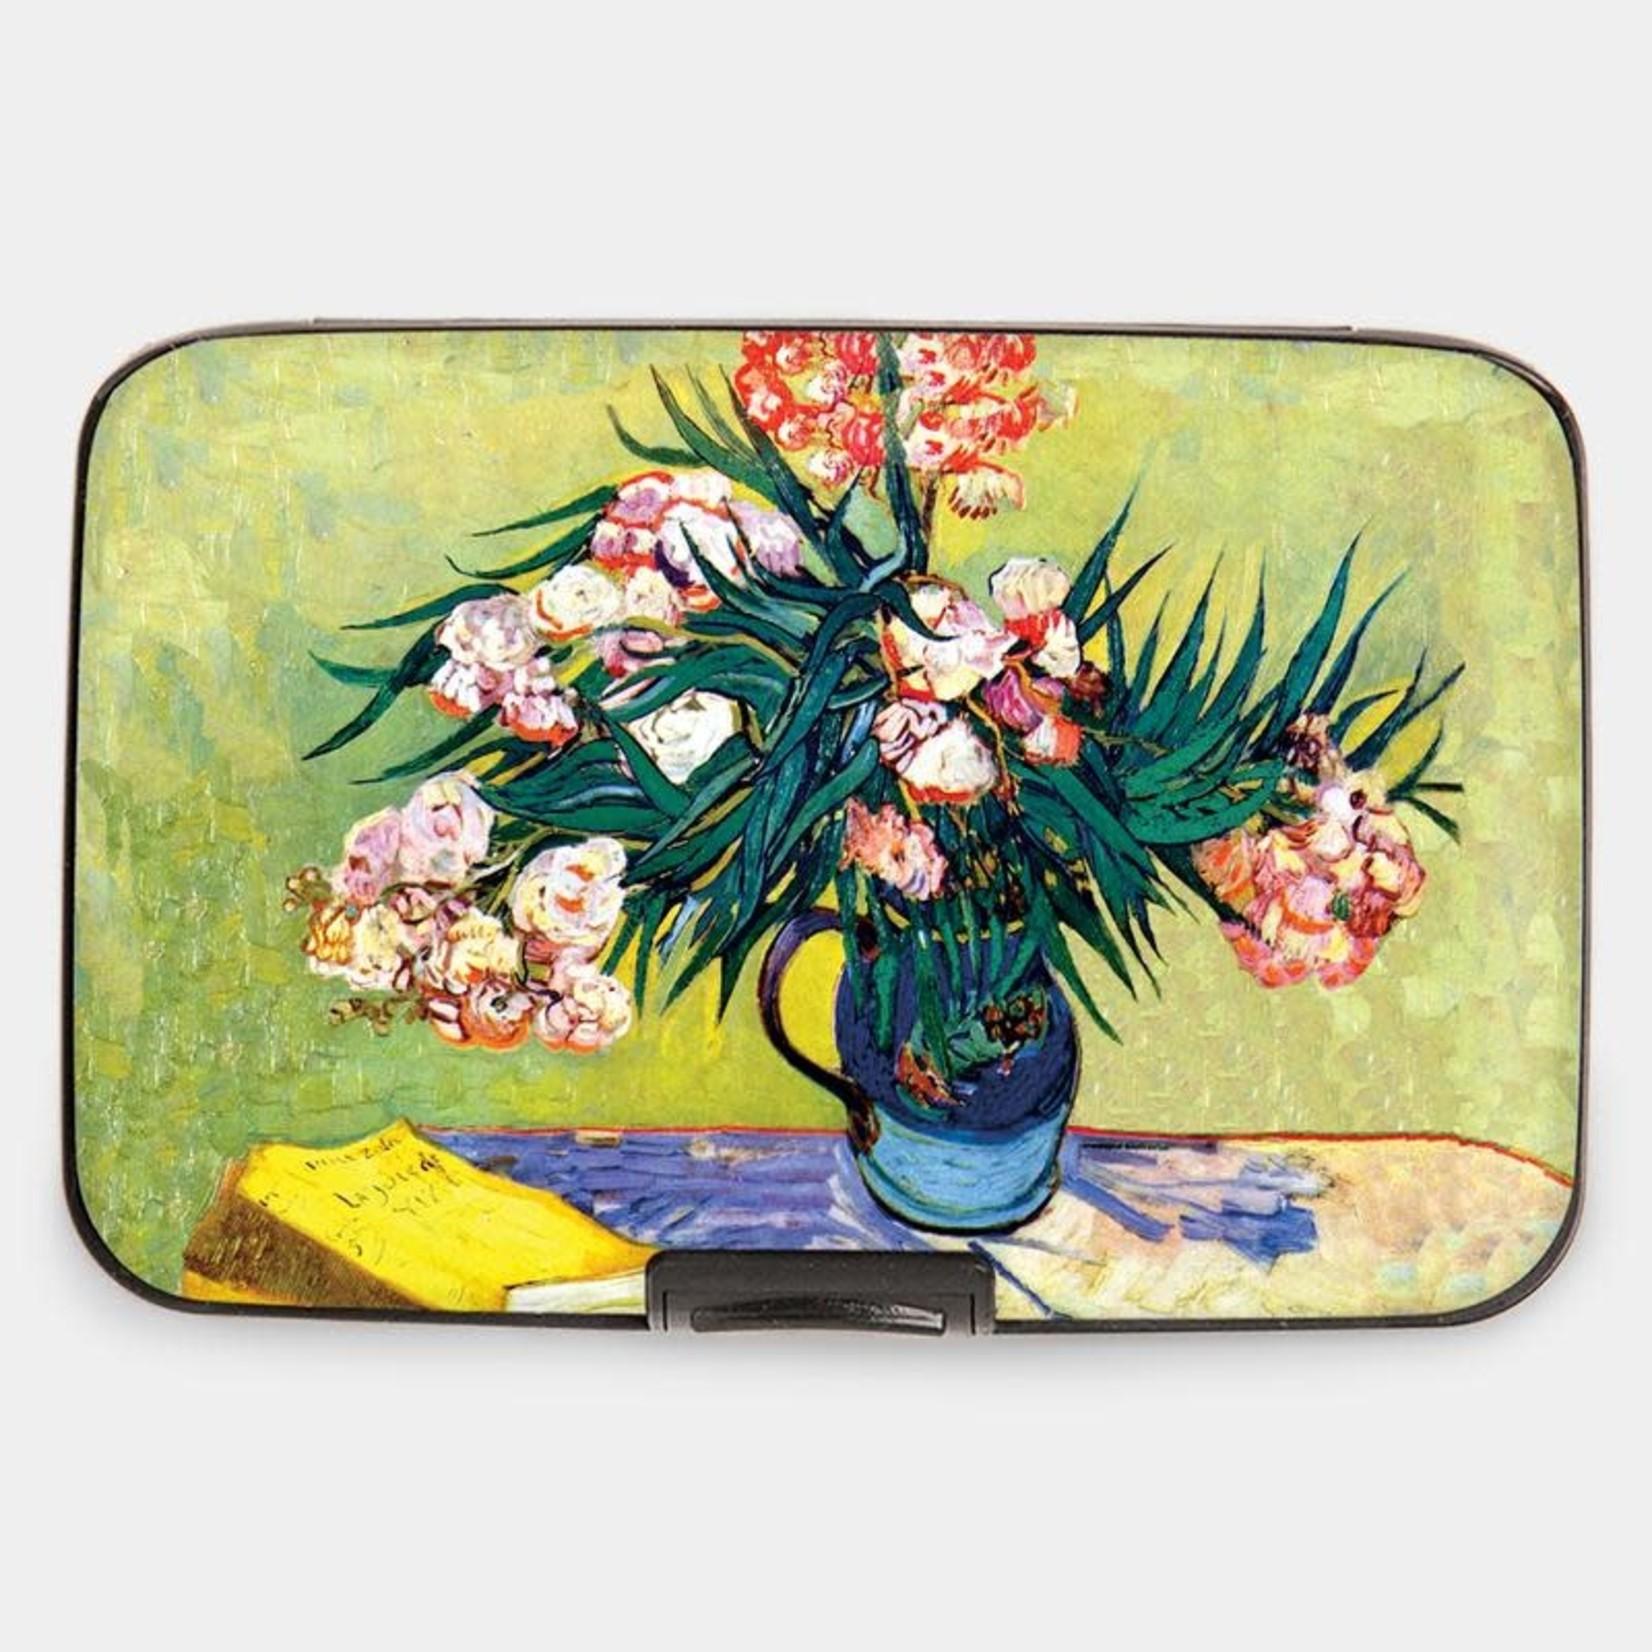 Monarque Armored Wallet - Van Gogh - Oleanders